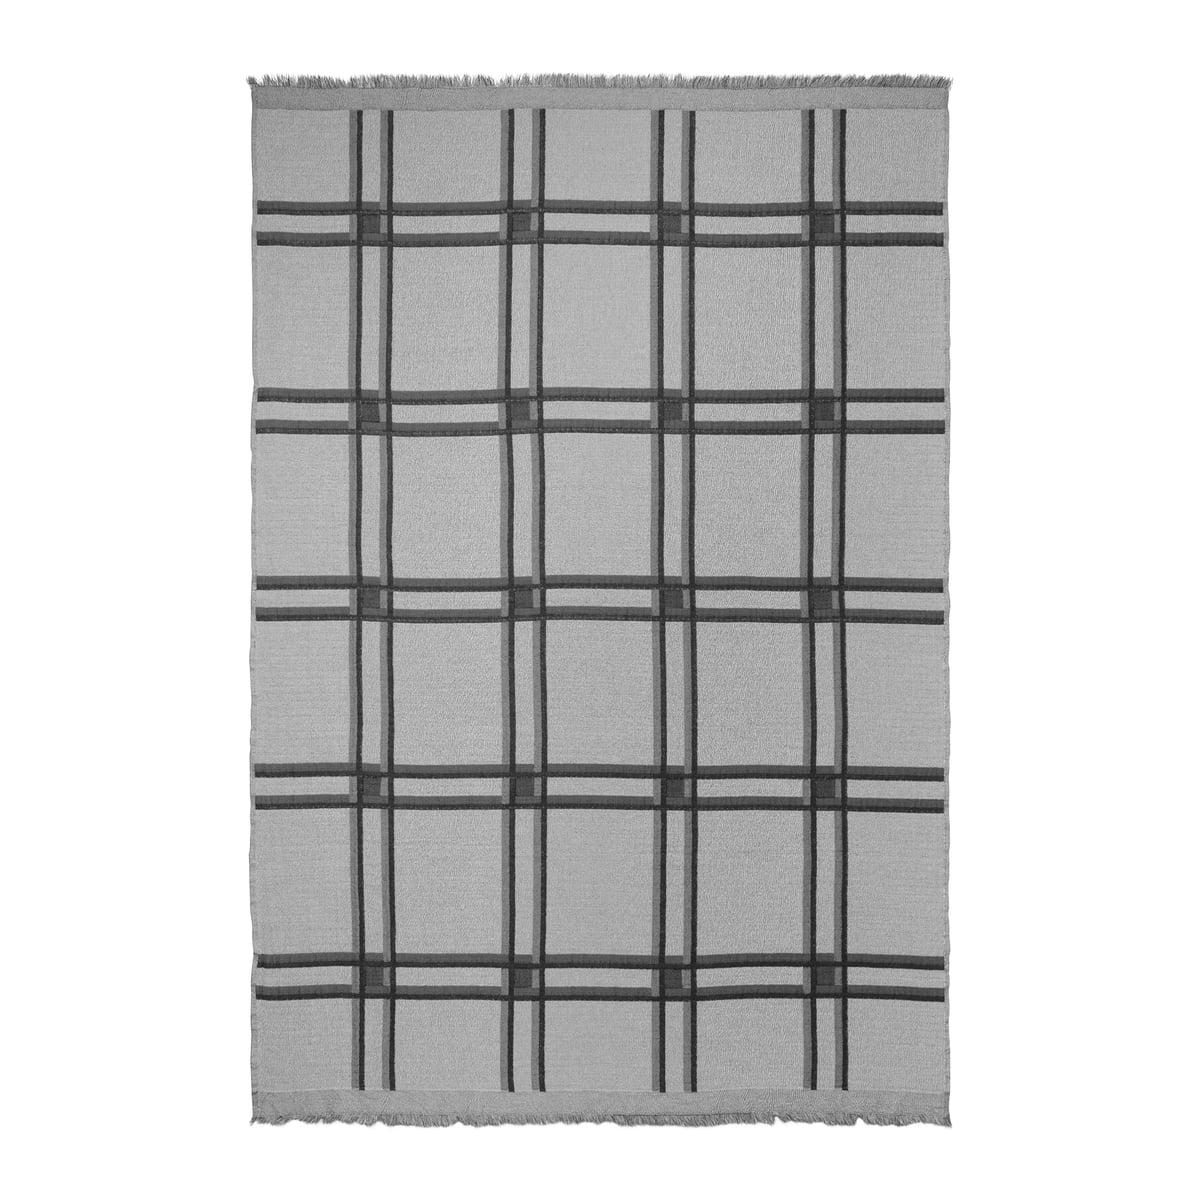 ferm living karierte wolldecke grau grau t 130 h 0 b 180 online kaufen bei woonio. Black Bedroom Furniture Sets. Home Design Ideas